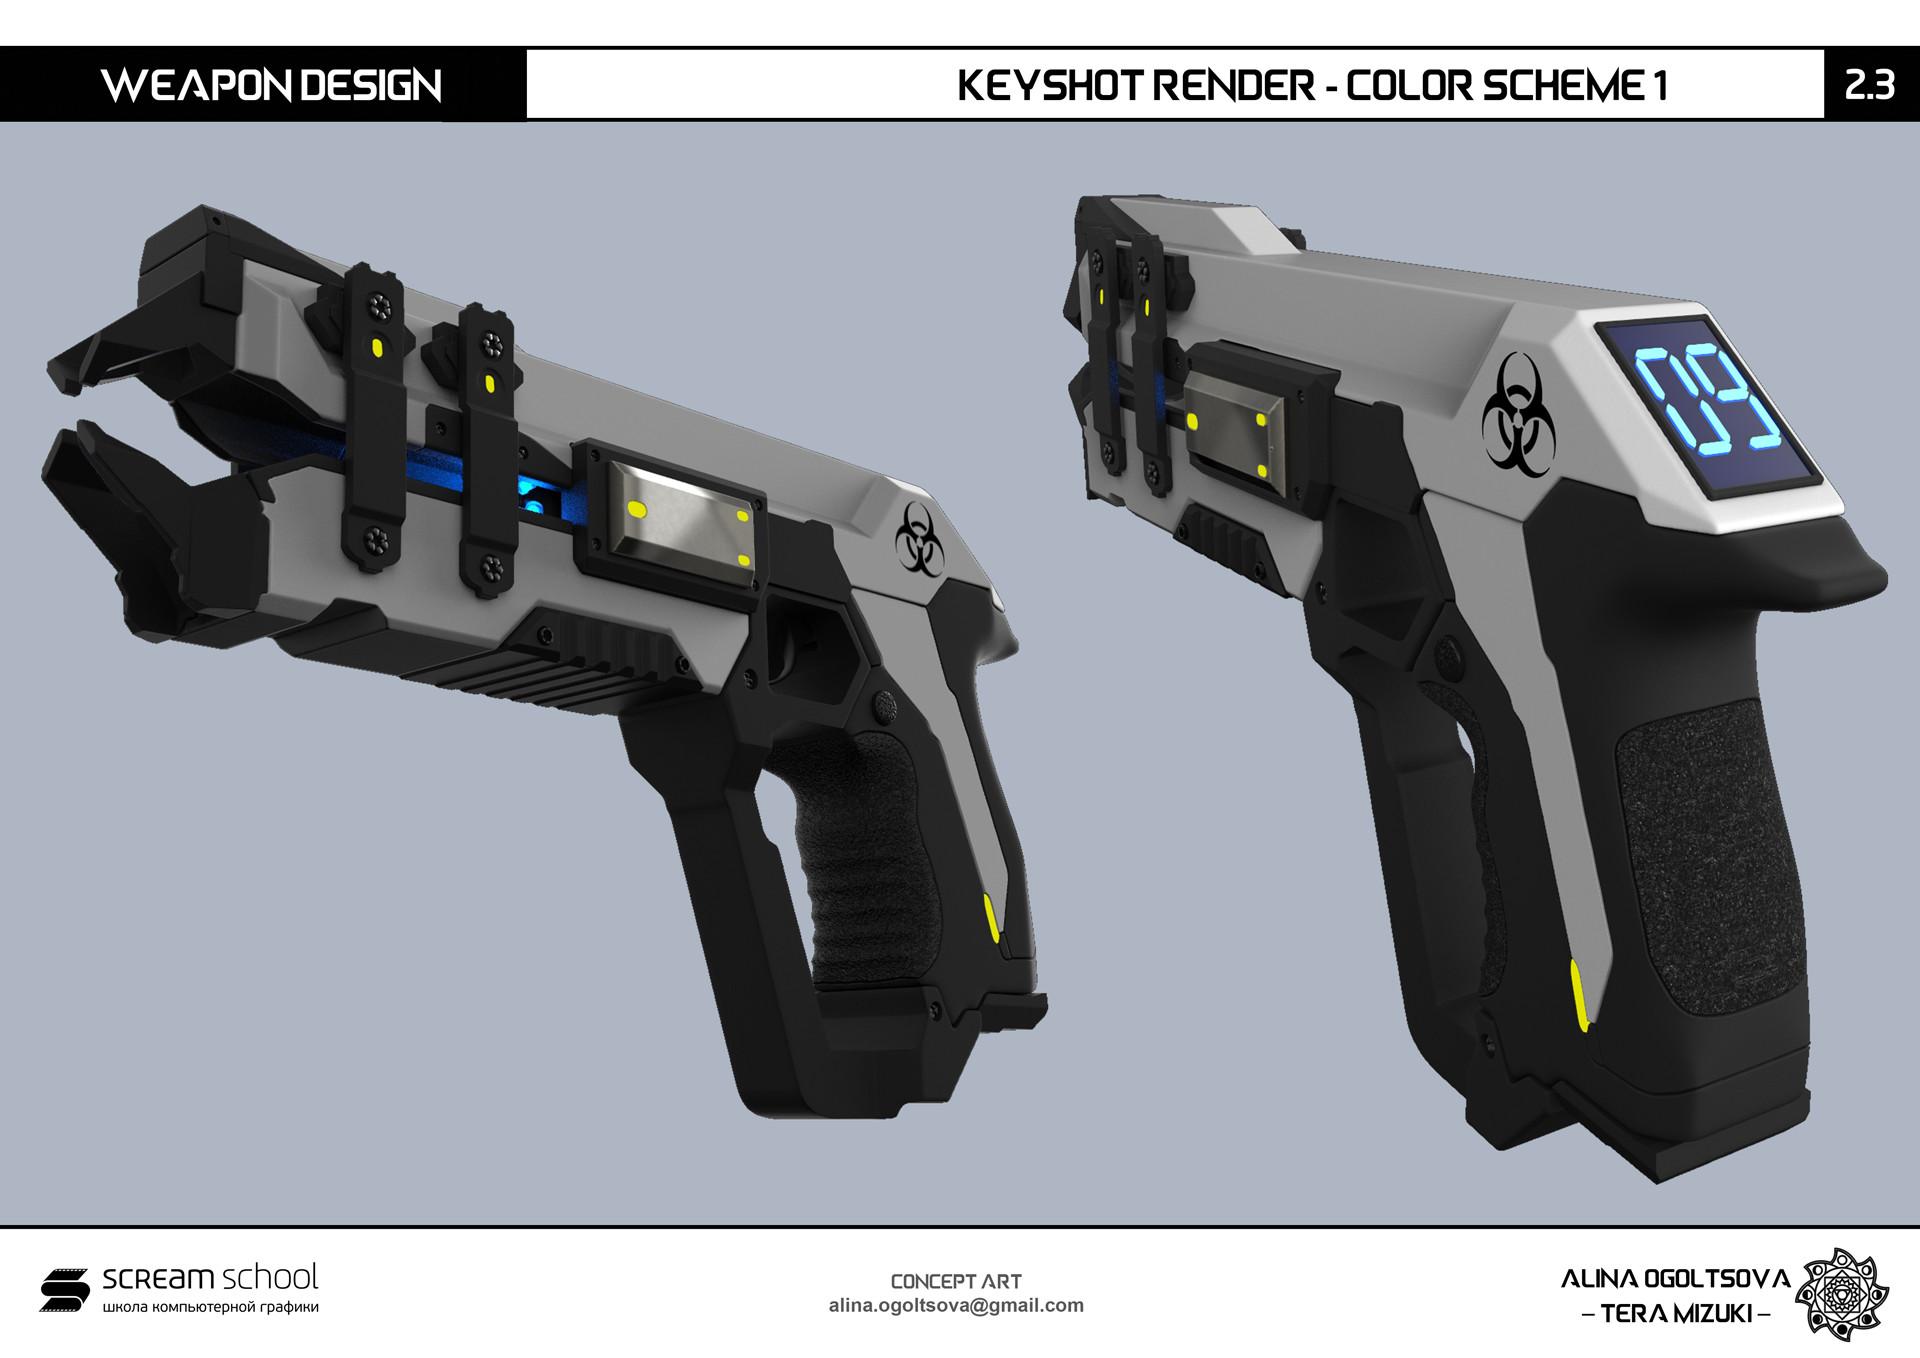 ArtStation - Weapon Design - Laser Pistol, Alina Ogoltsova